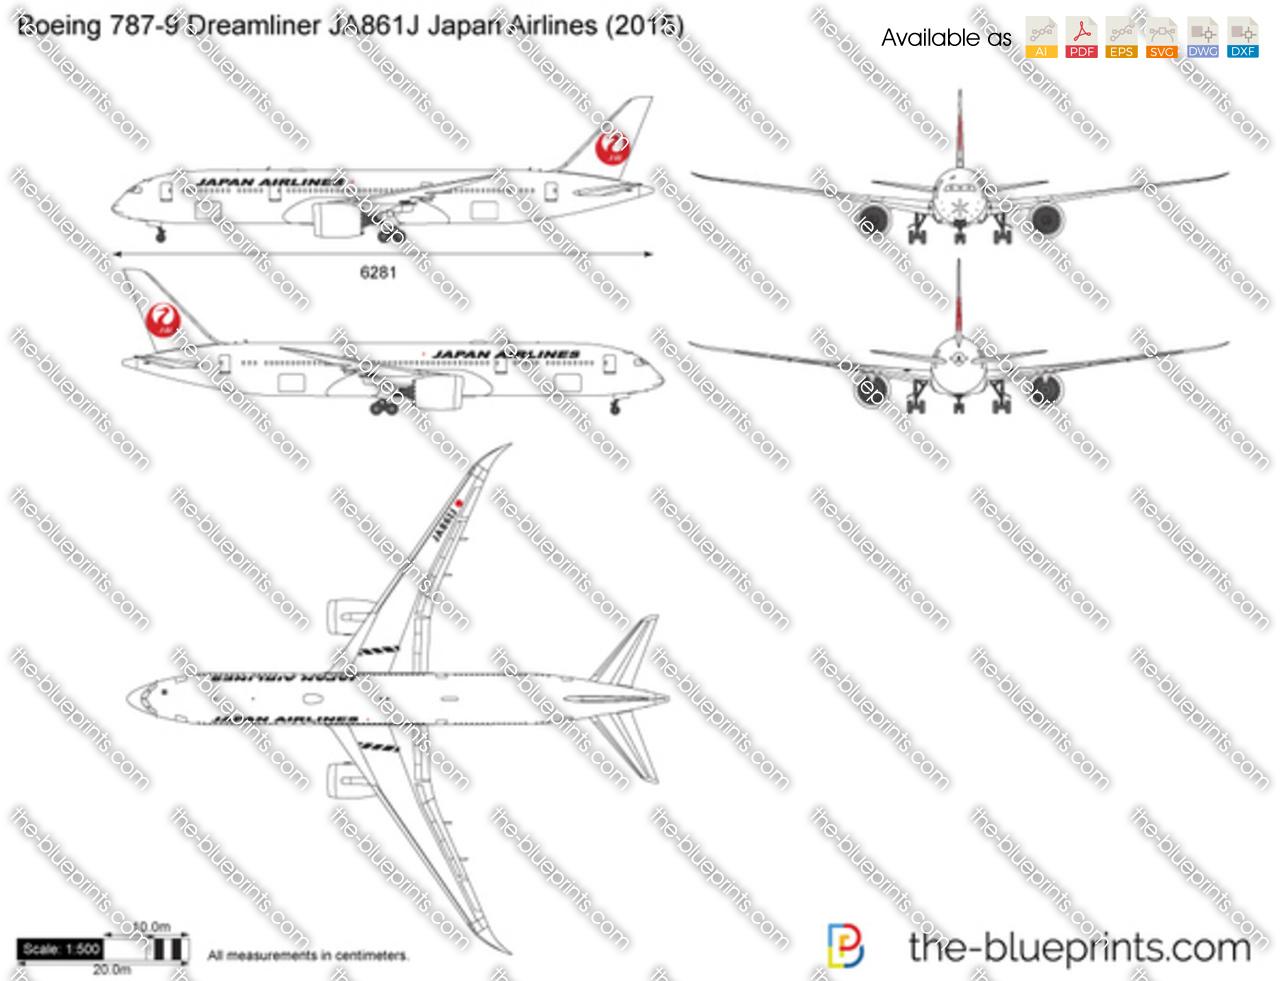 Boeing 787-9 Dreamliner JA861J Japan Airlines 2017